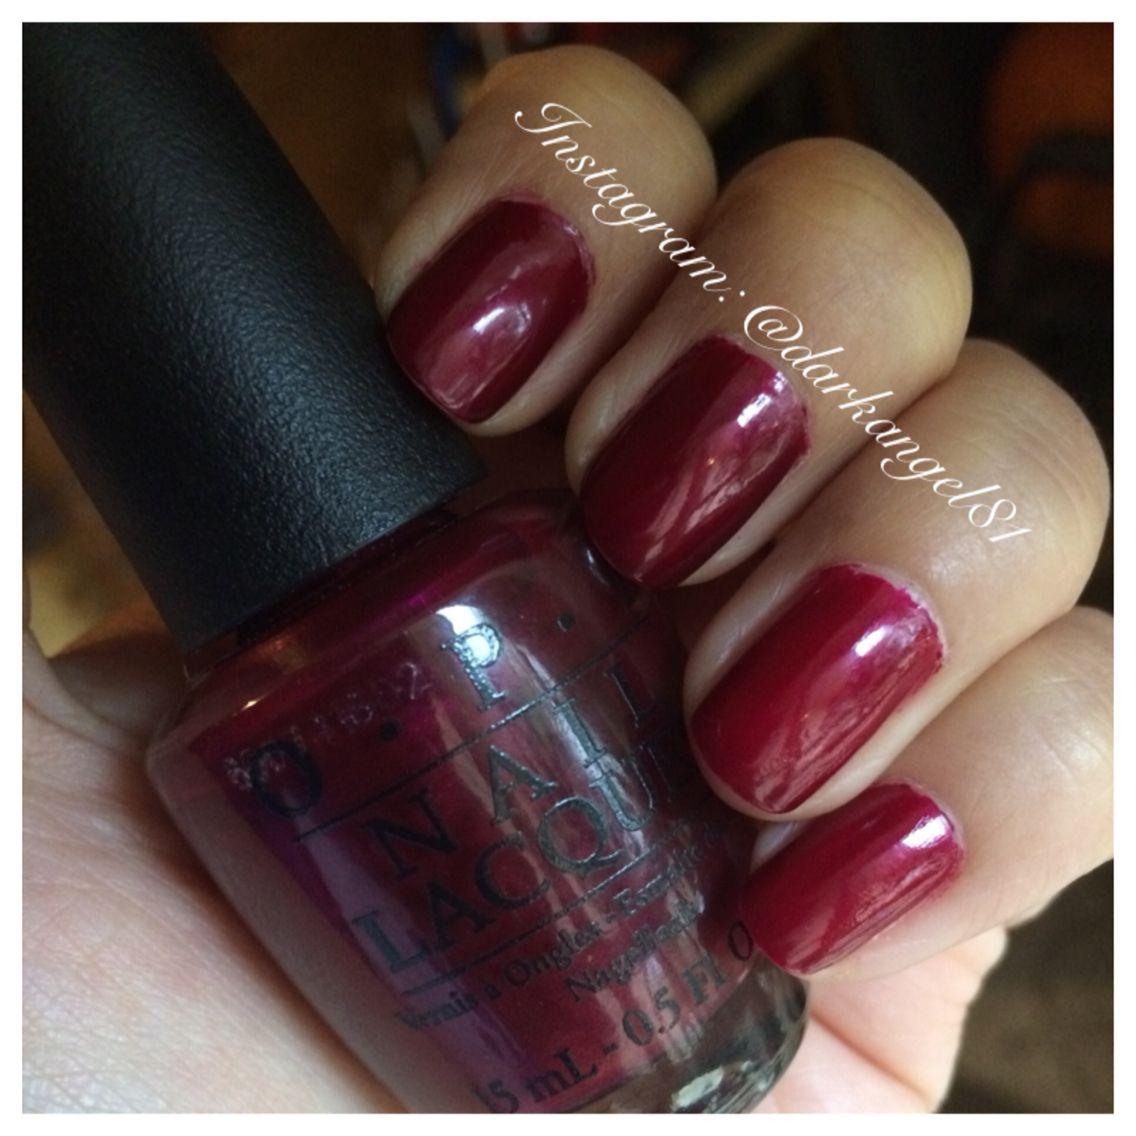 OPI Bastille My Heart. | Nails! | Pinterest | Bastille and OPI